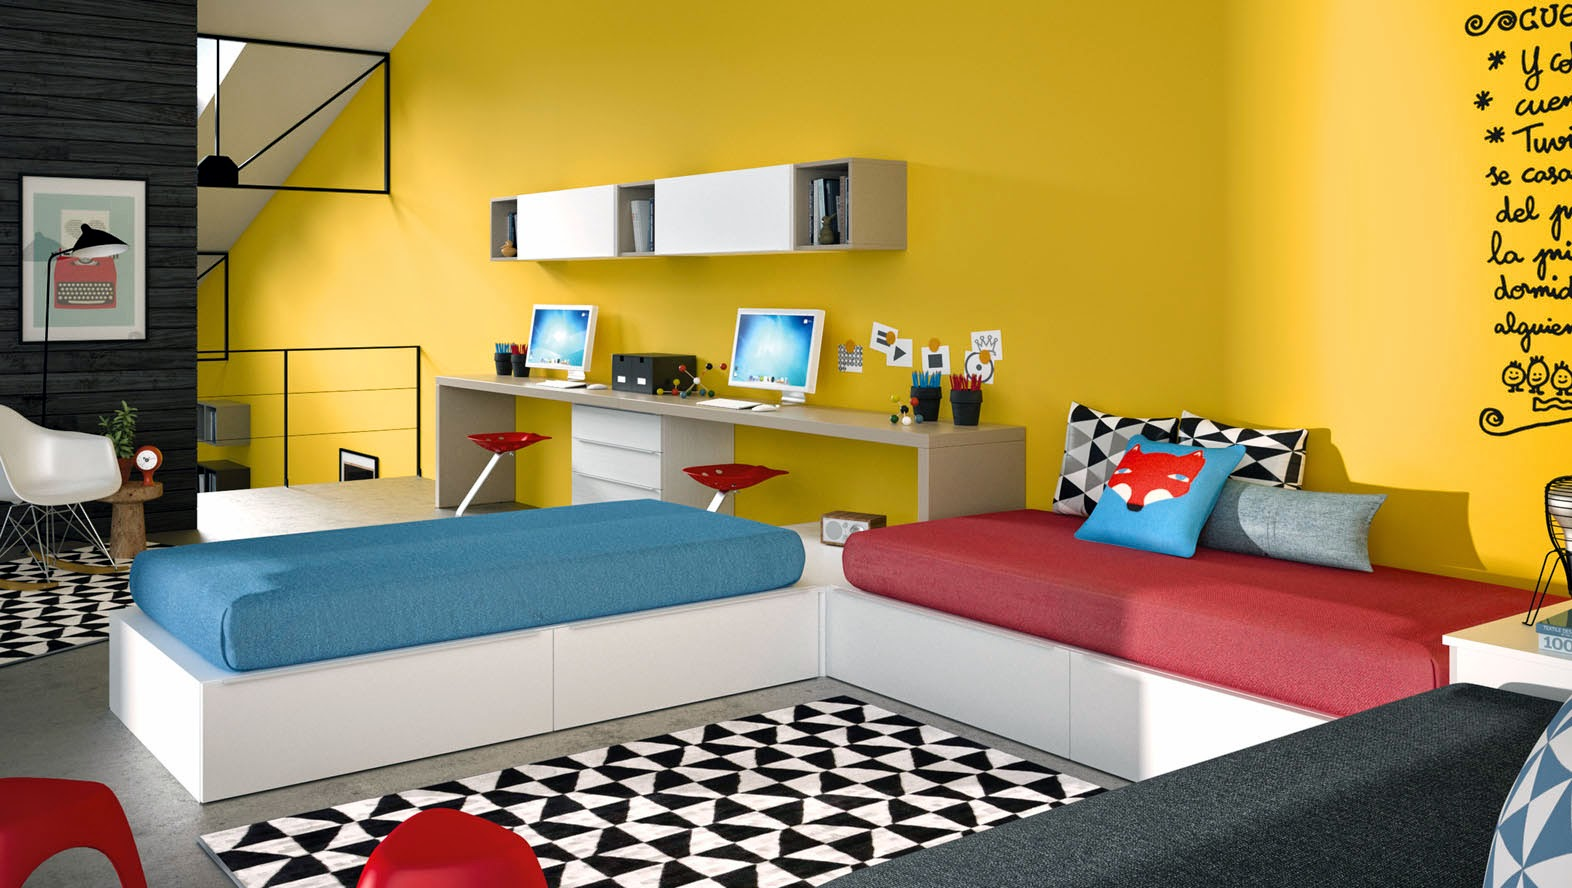 dormitorios juveniles para dos hermanos